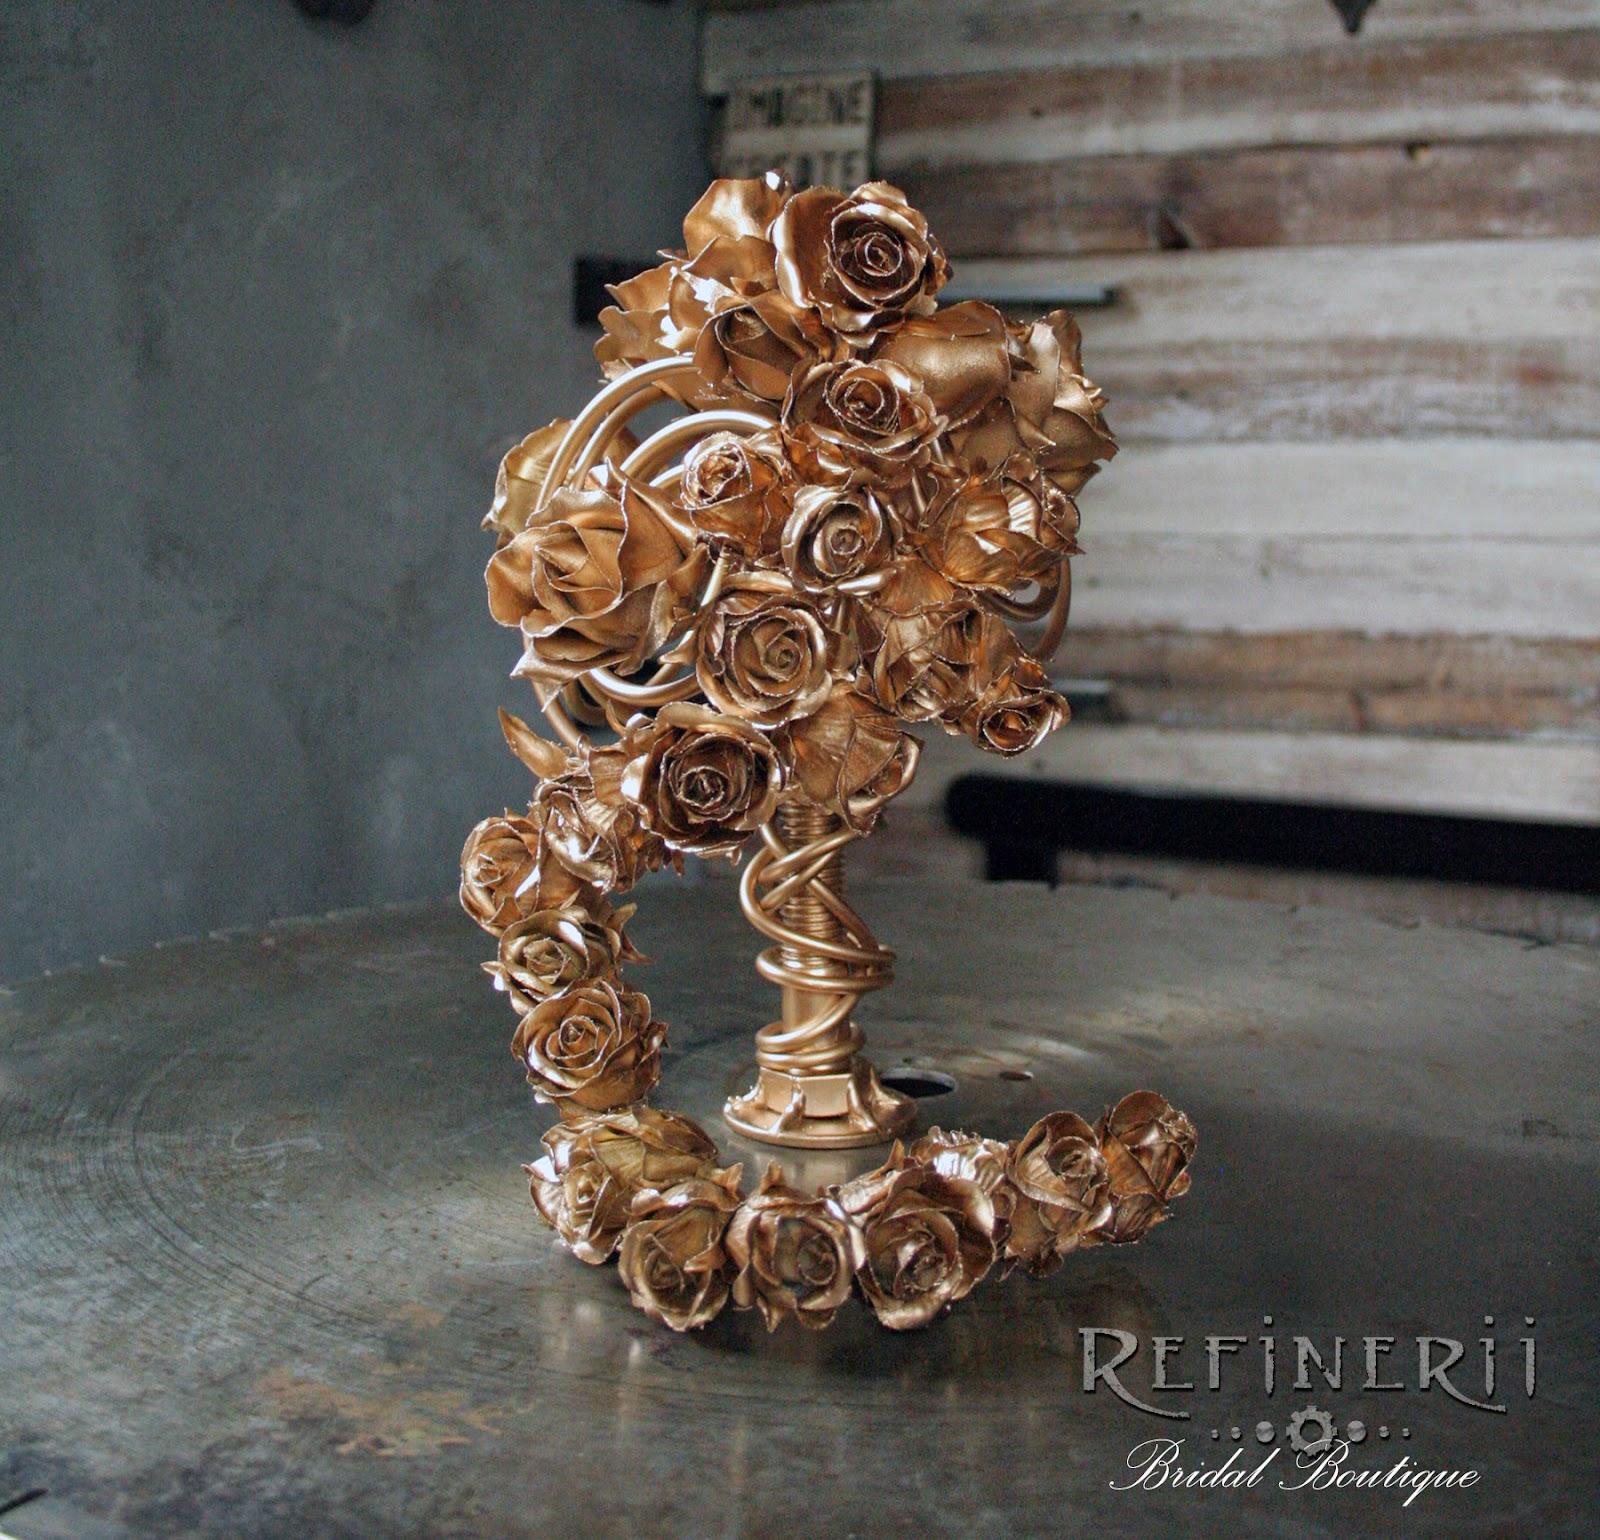 alternative bouquet unique gold roses metal perpetual flowers offbeat bride